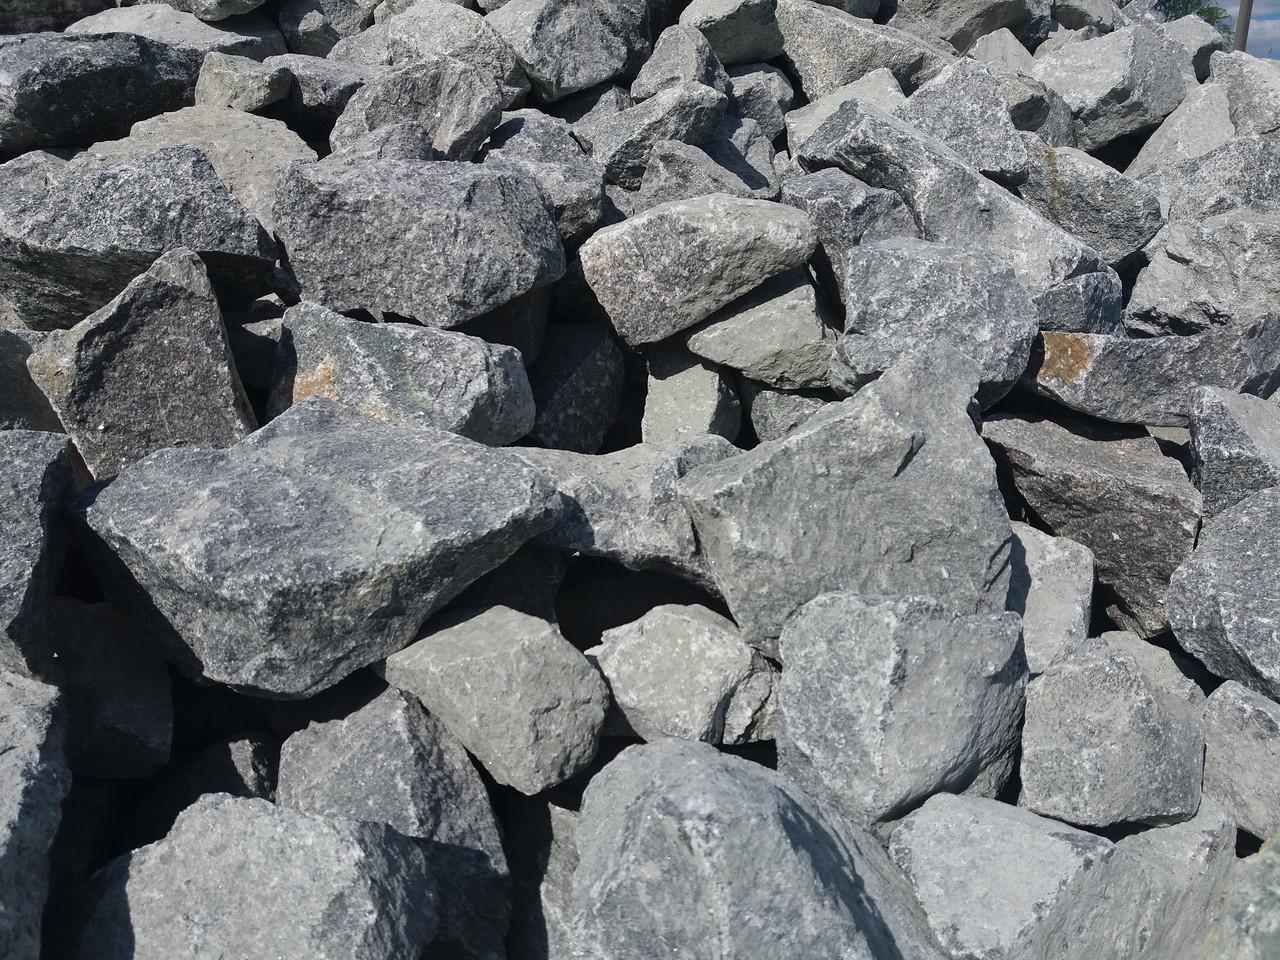 Камень бутовый серый 150-300 мм, фото 1